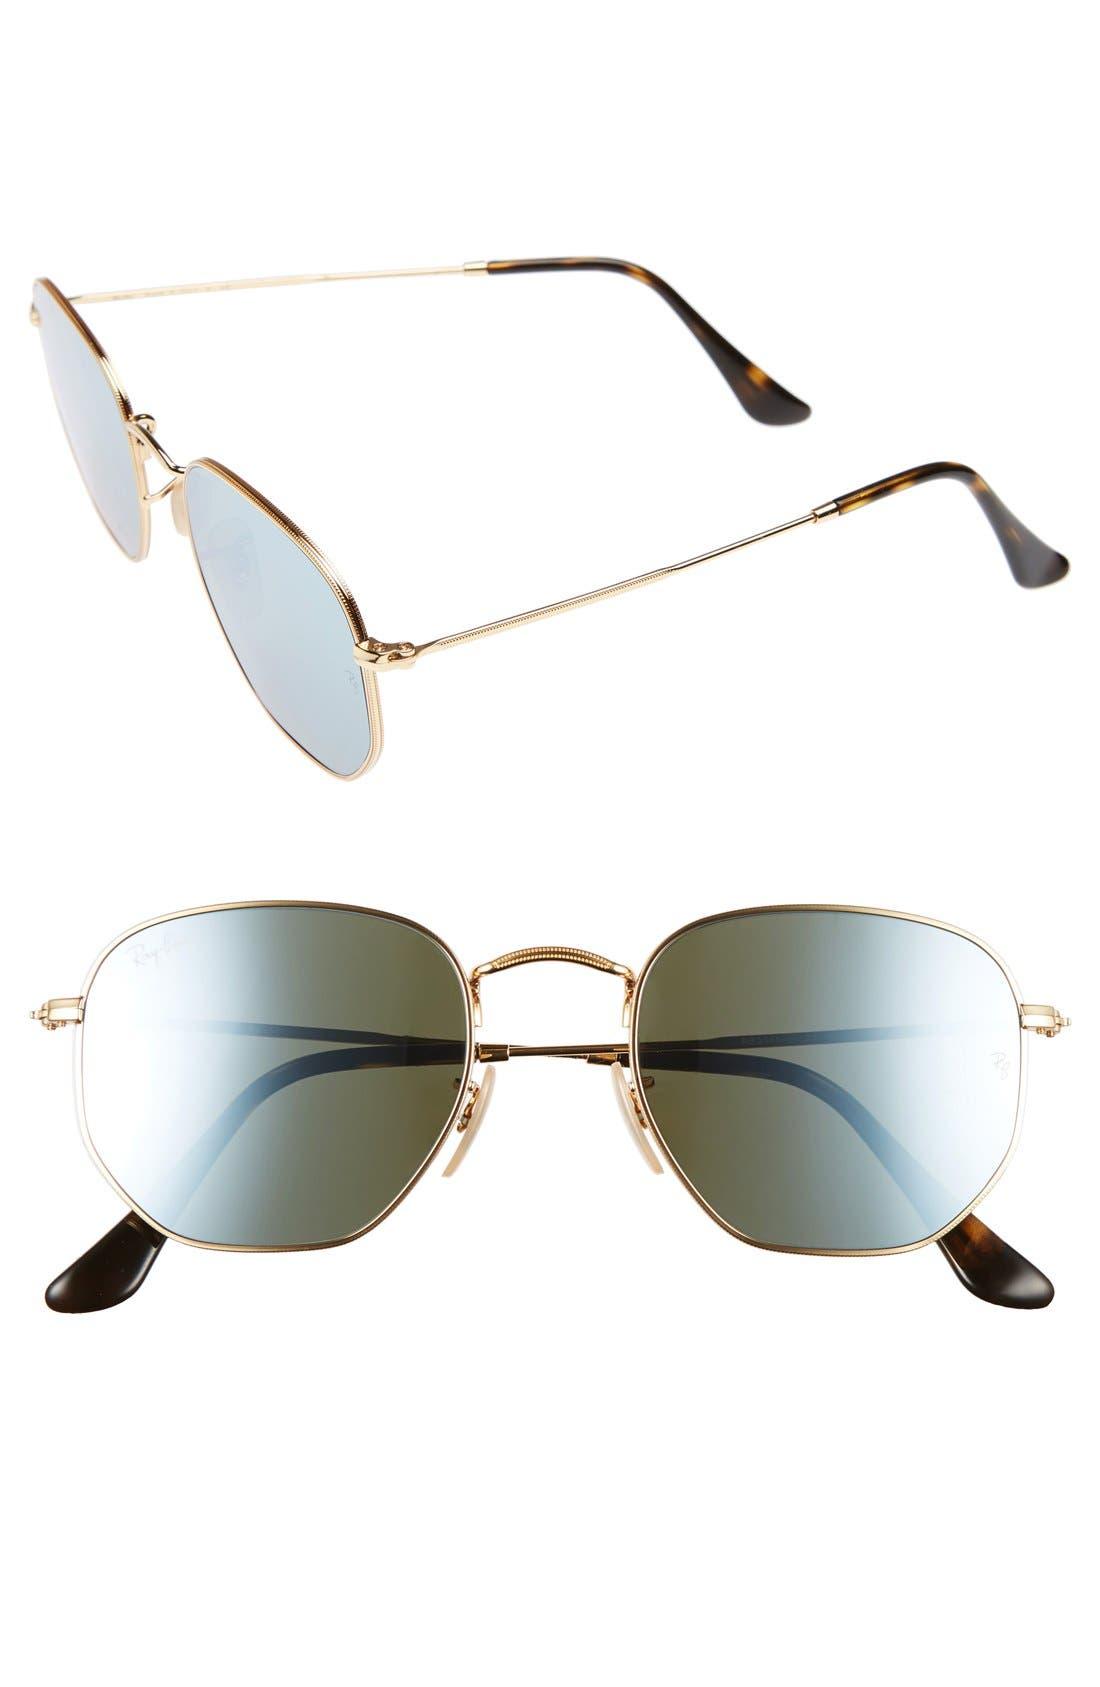 51mm Sunglasses,                             Alternate thumbnail 4, color,                             710